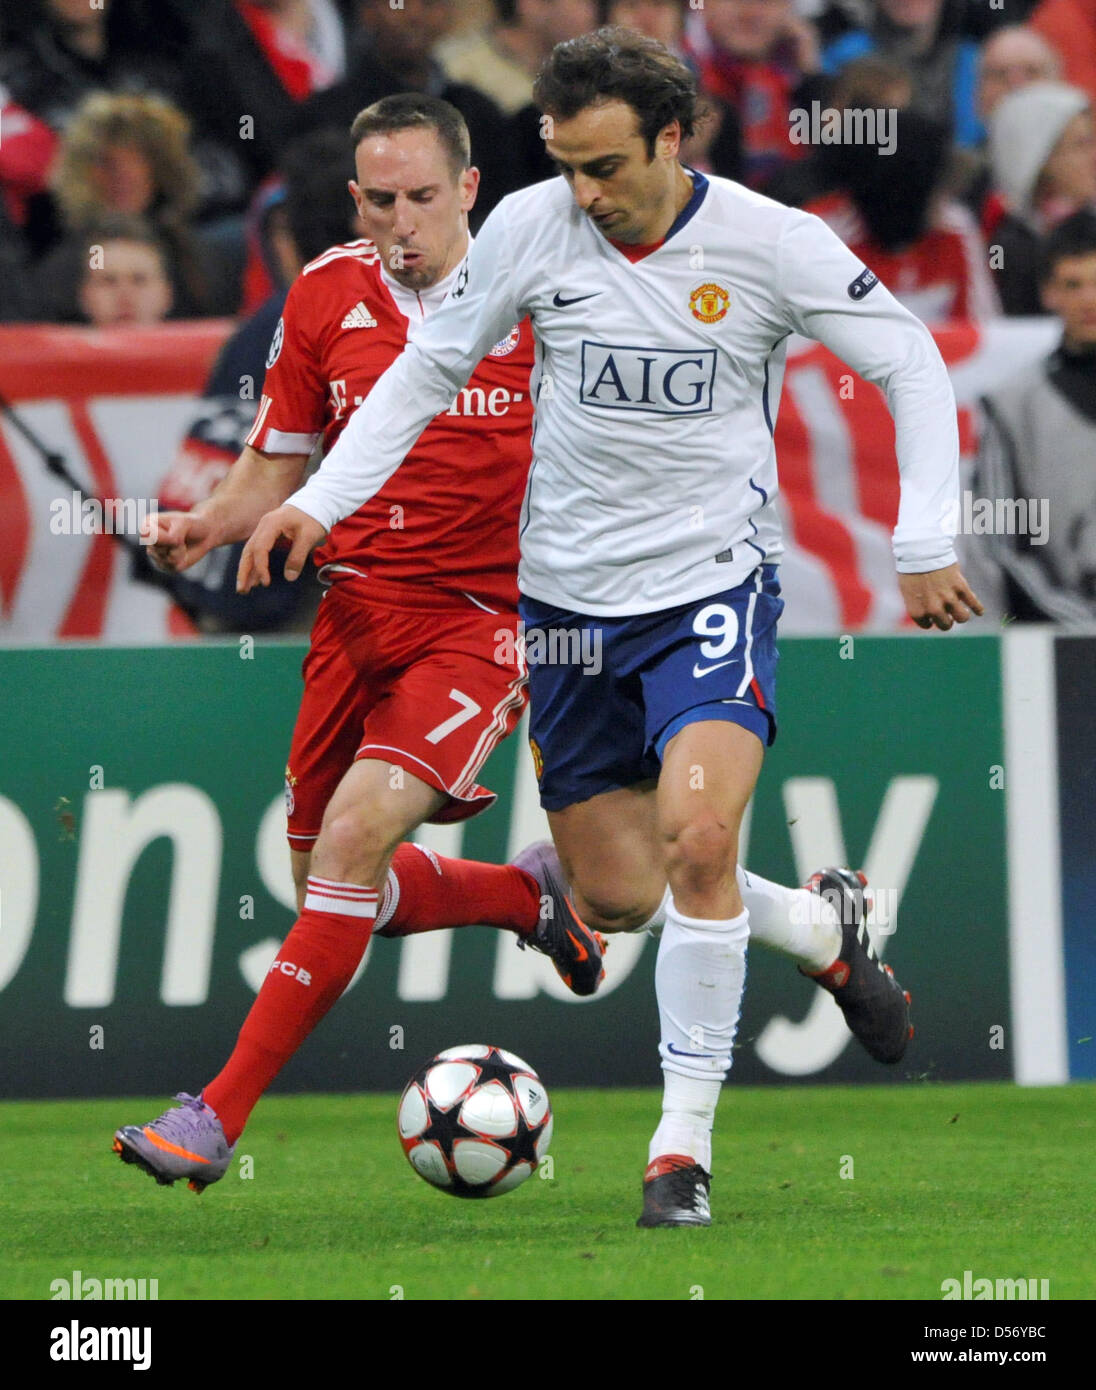 United s Dimitar Berbatov R Munich s Franck Ribery L vie for